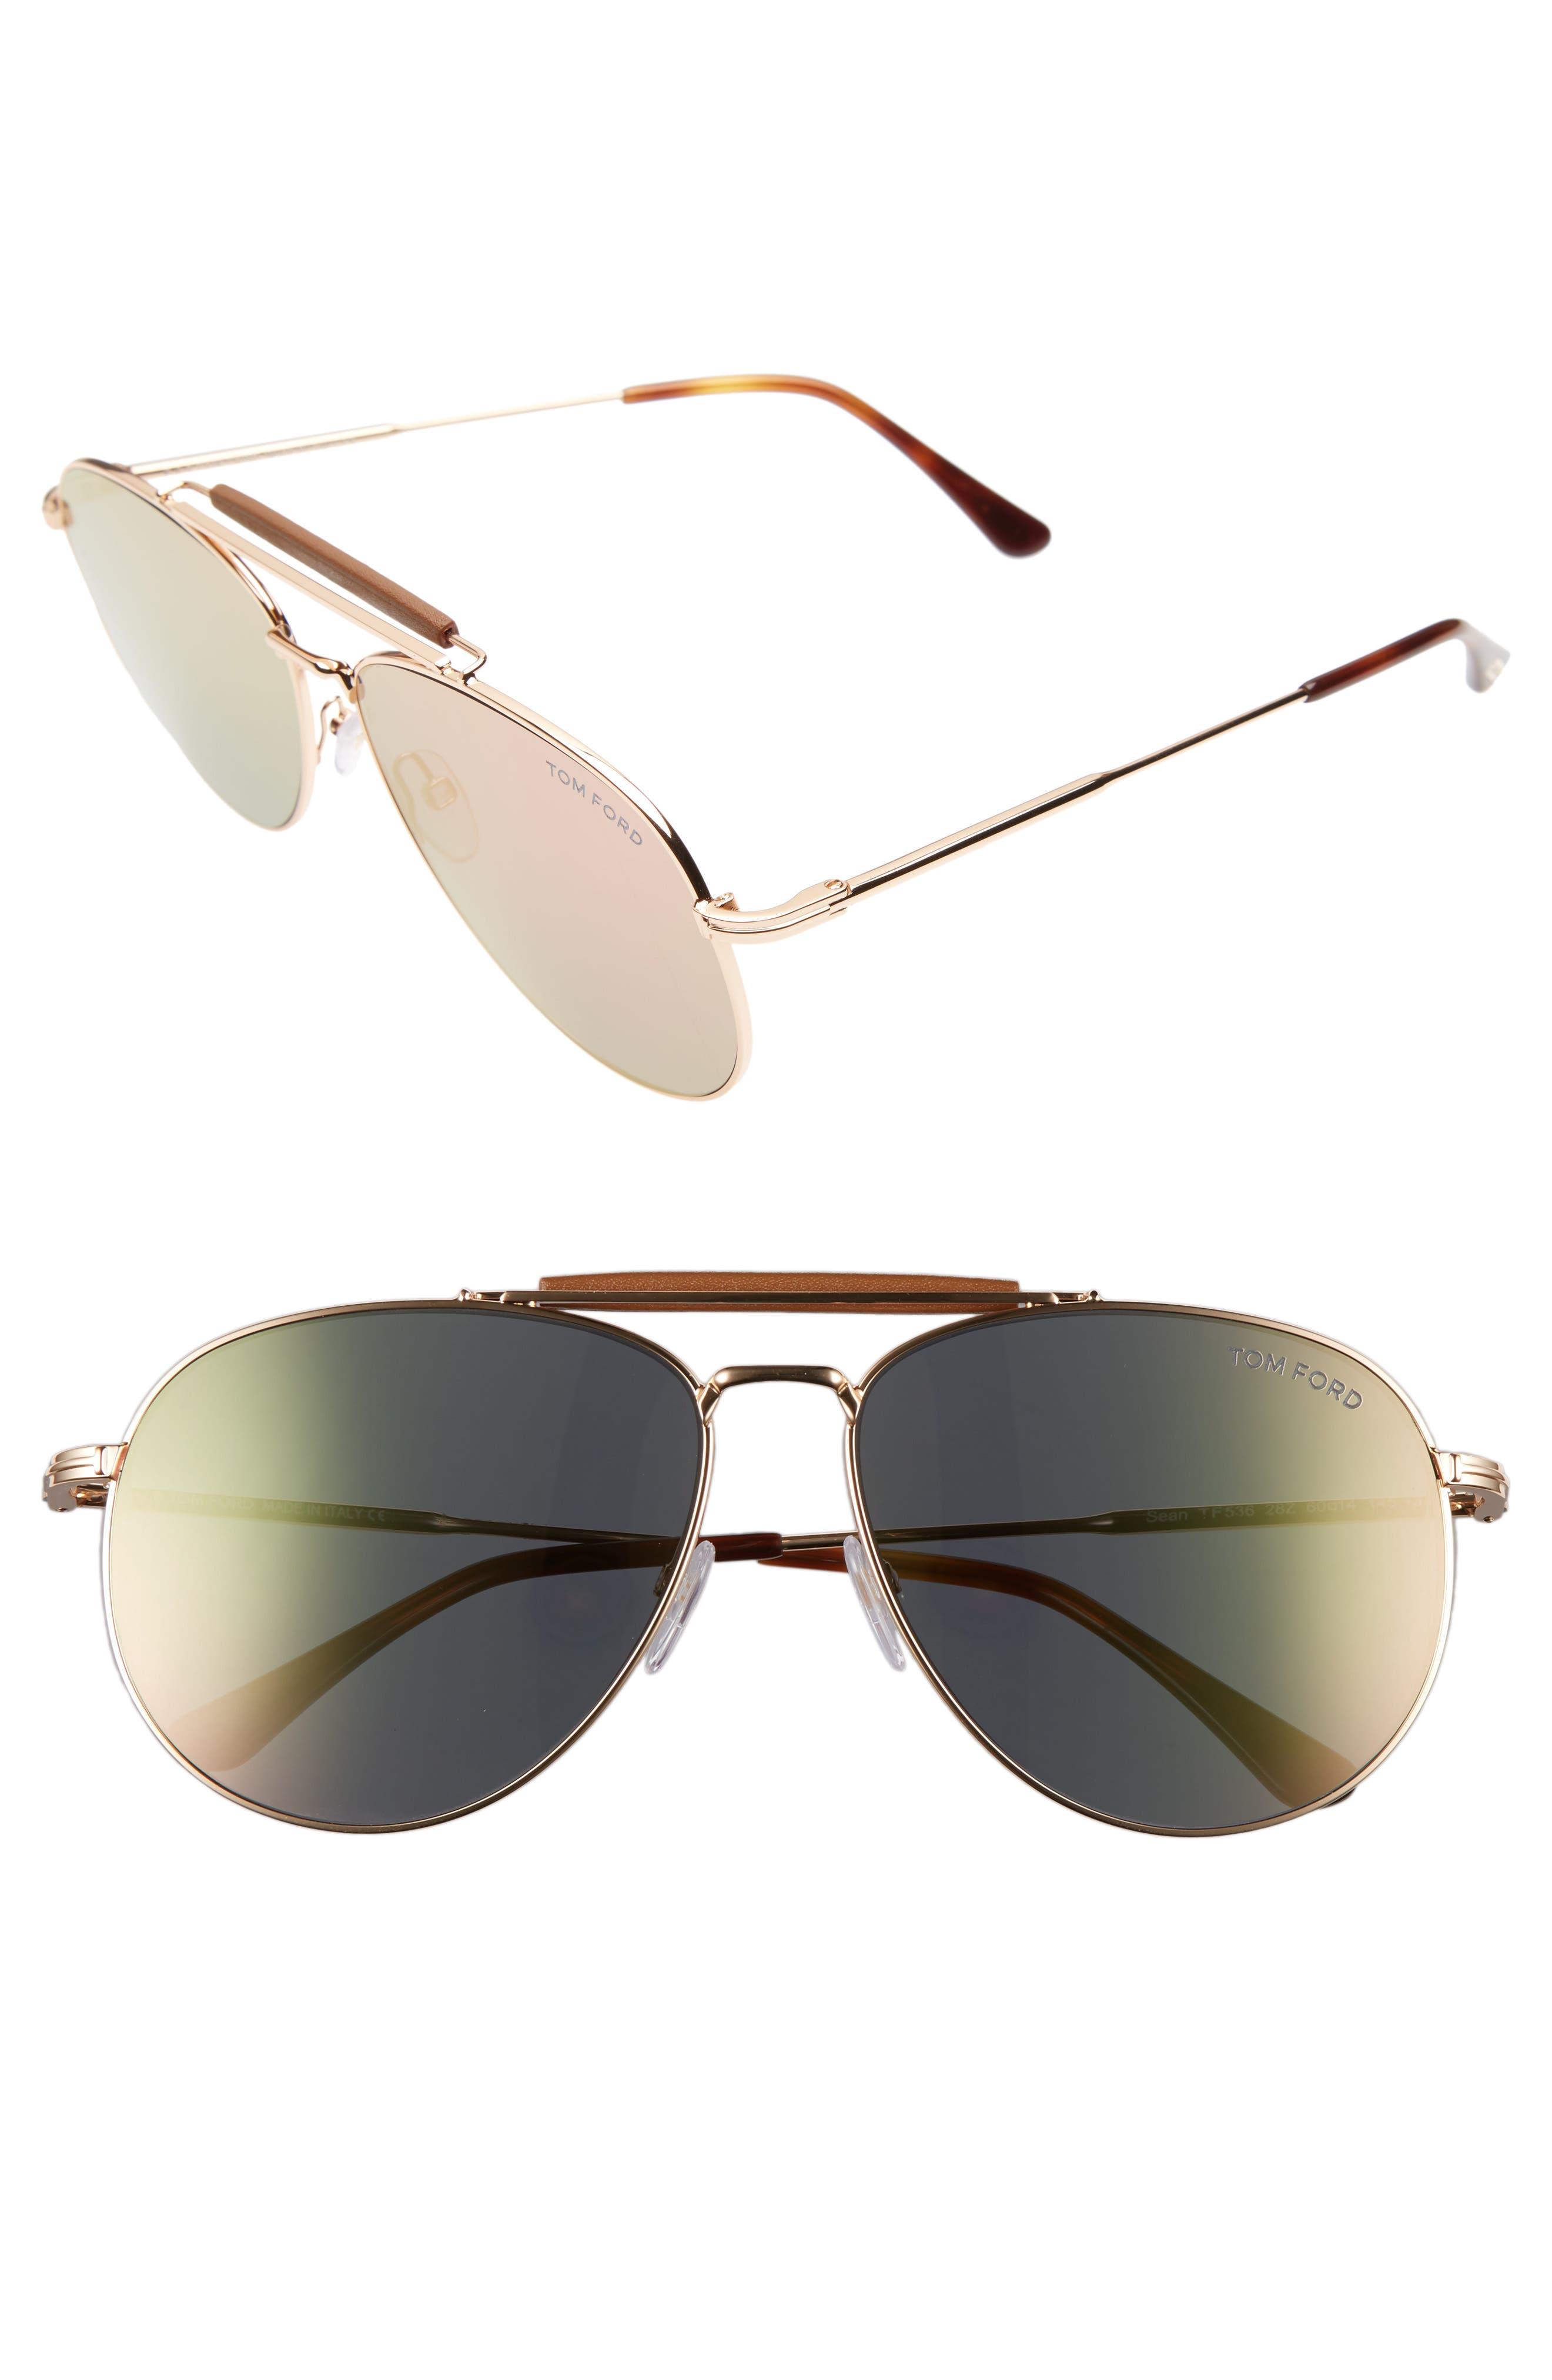 Sean 60mm Aviator Sunglasses,                             Main thumbnail 1, color,                             ROSE GOLD/ BROWN/ PINK MIRROR